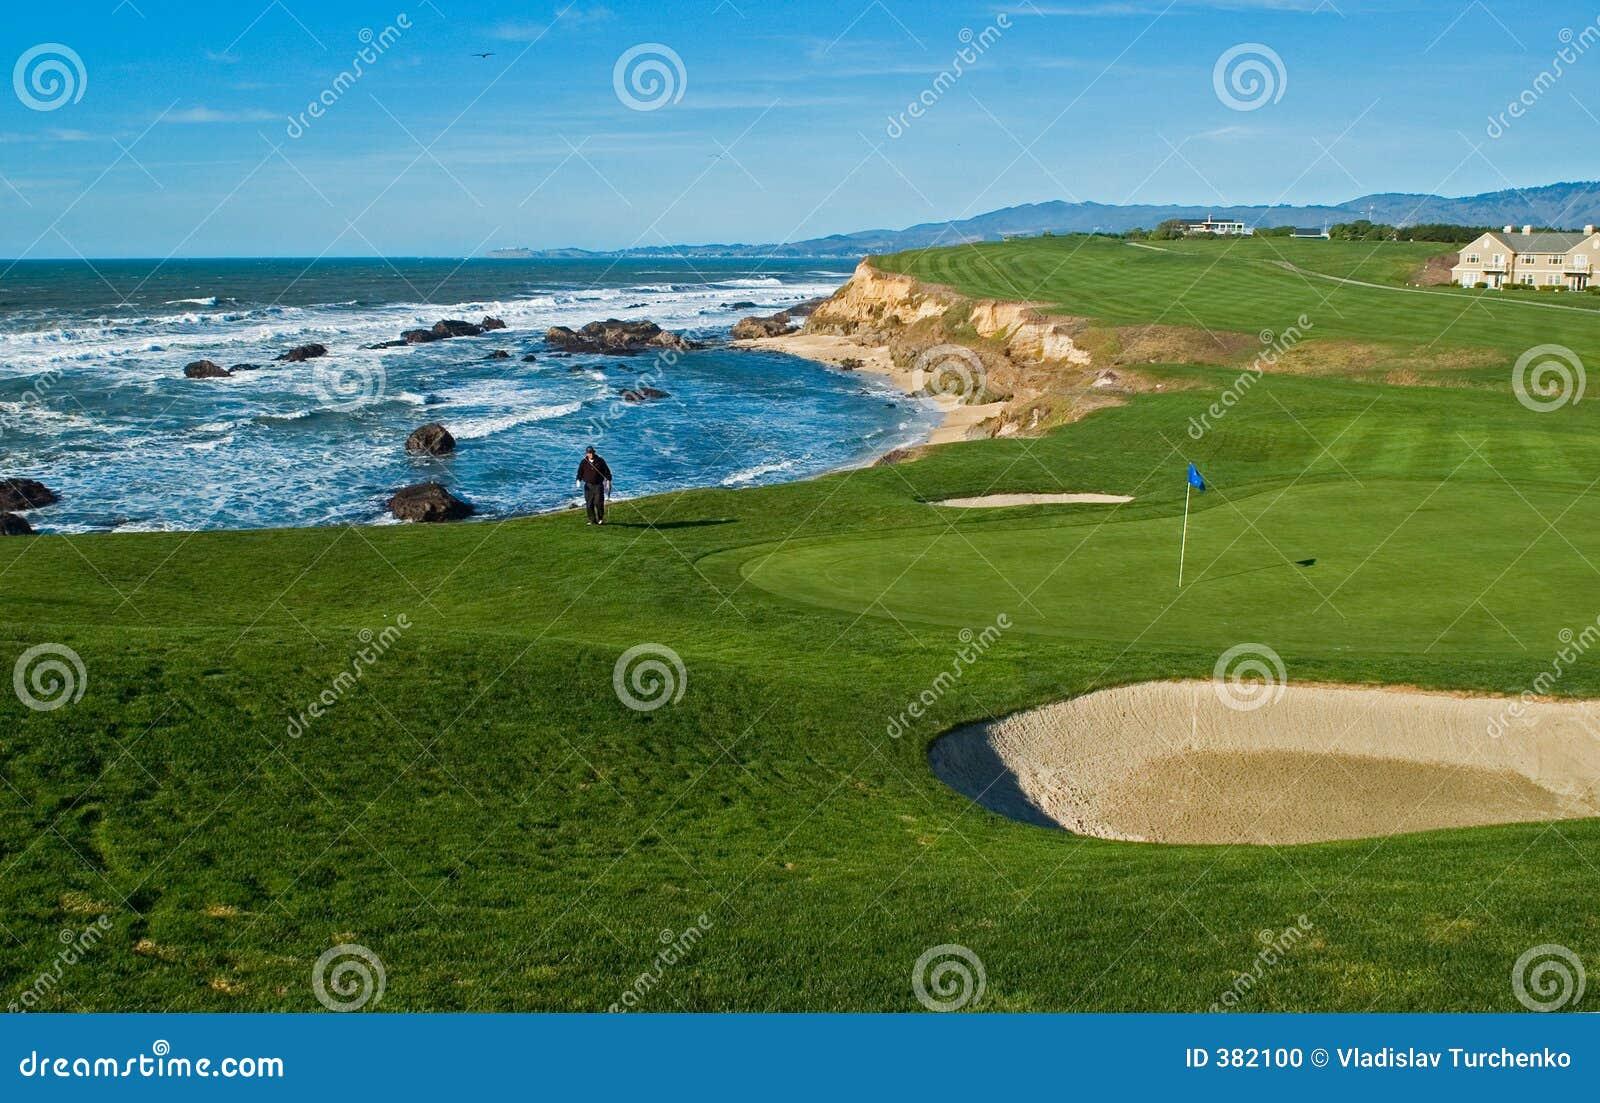 Campo de golfe litoral